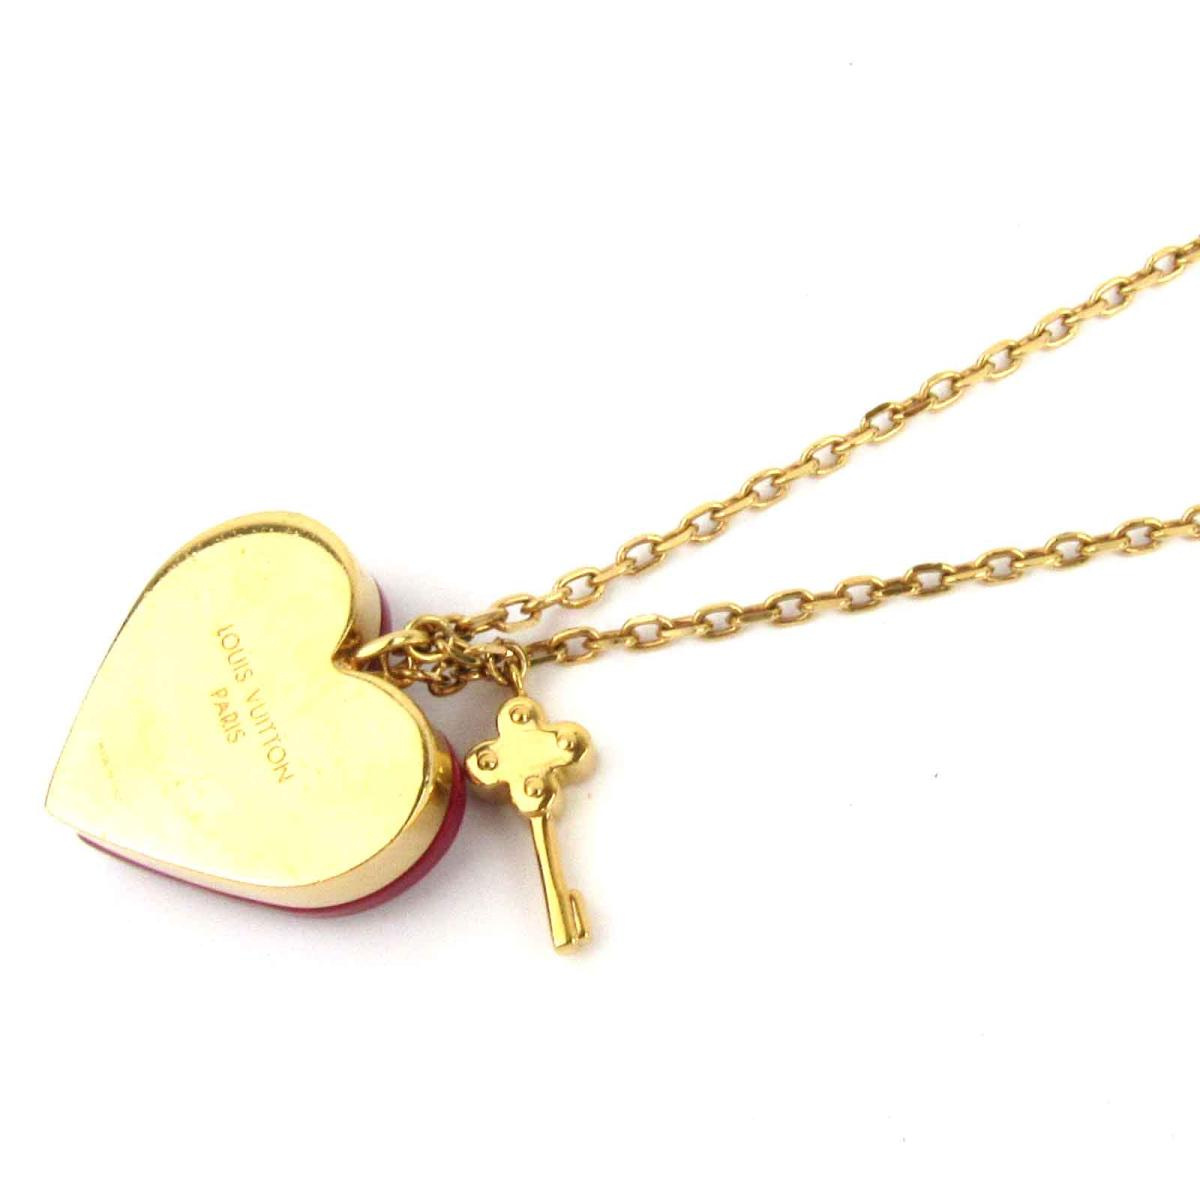 Louis Vuitton Bakery Dan TIFF lock me necklace accessories Lady's GP (gold  plating) (M66516)